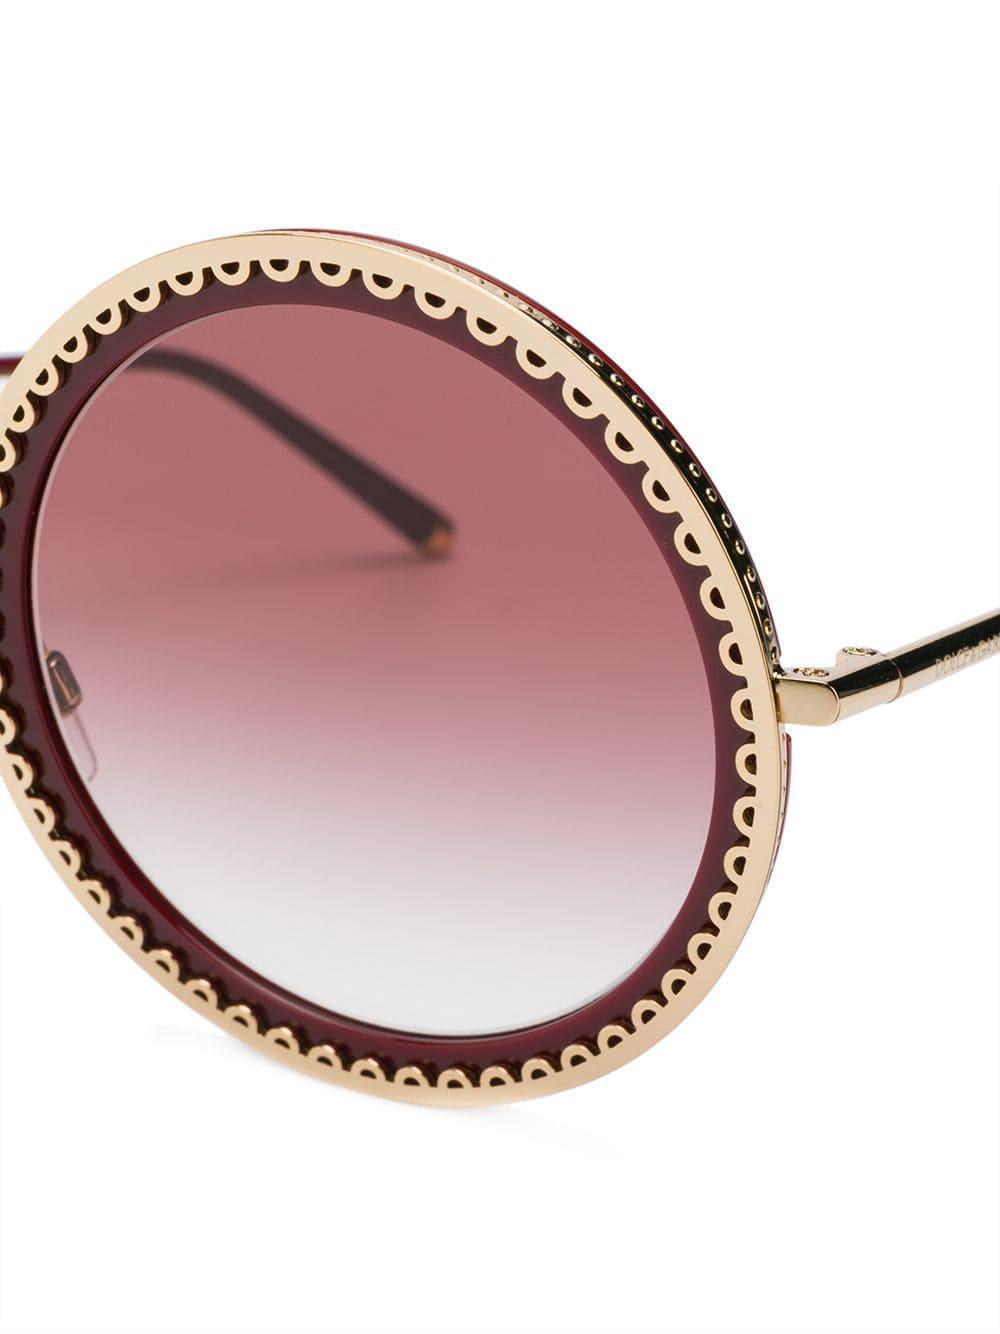 77387fd22d38 Dolce & Gabbana - Red Cuore Sacro Sunglasses - Lyst. View fullscreen